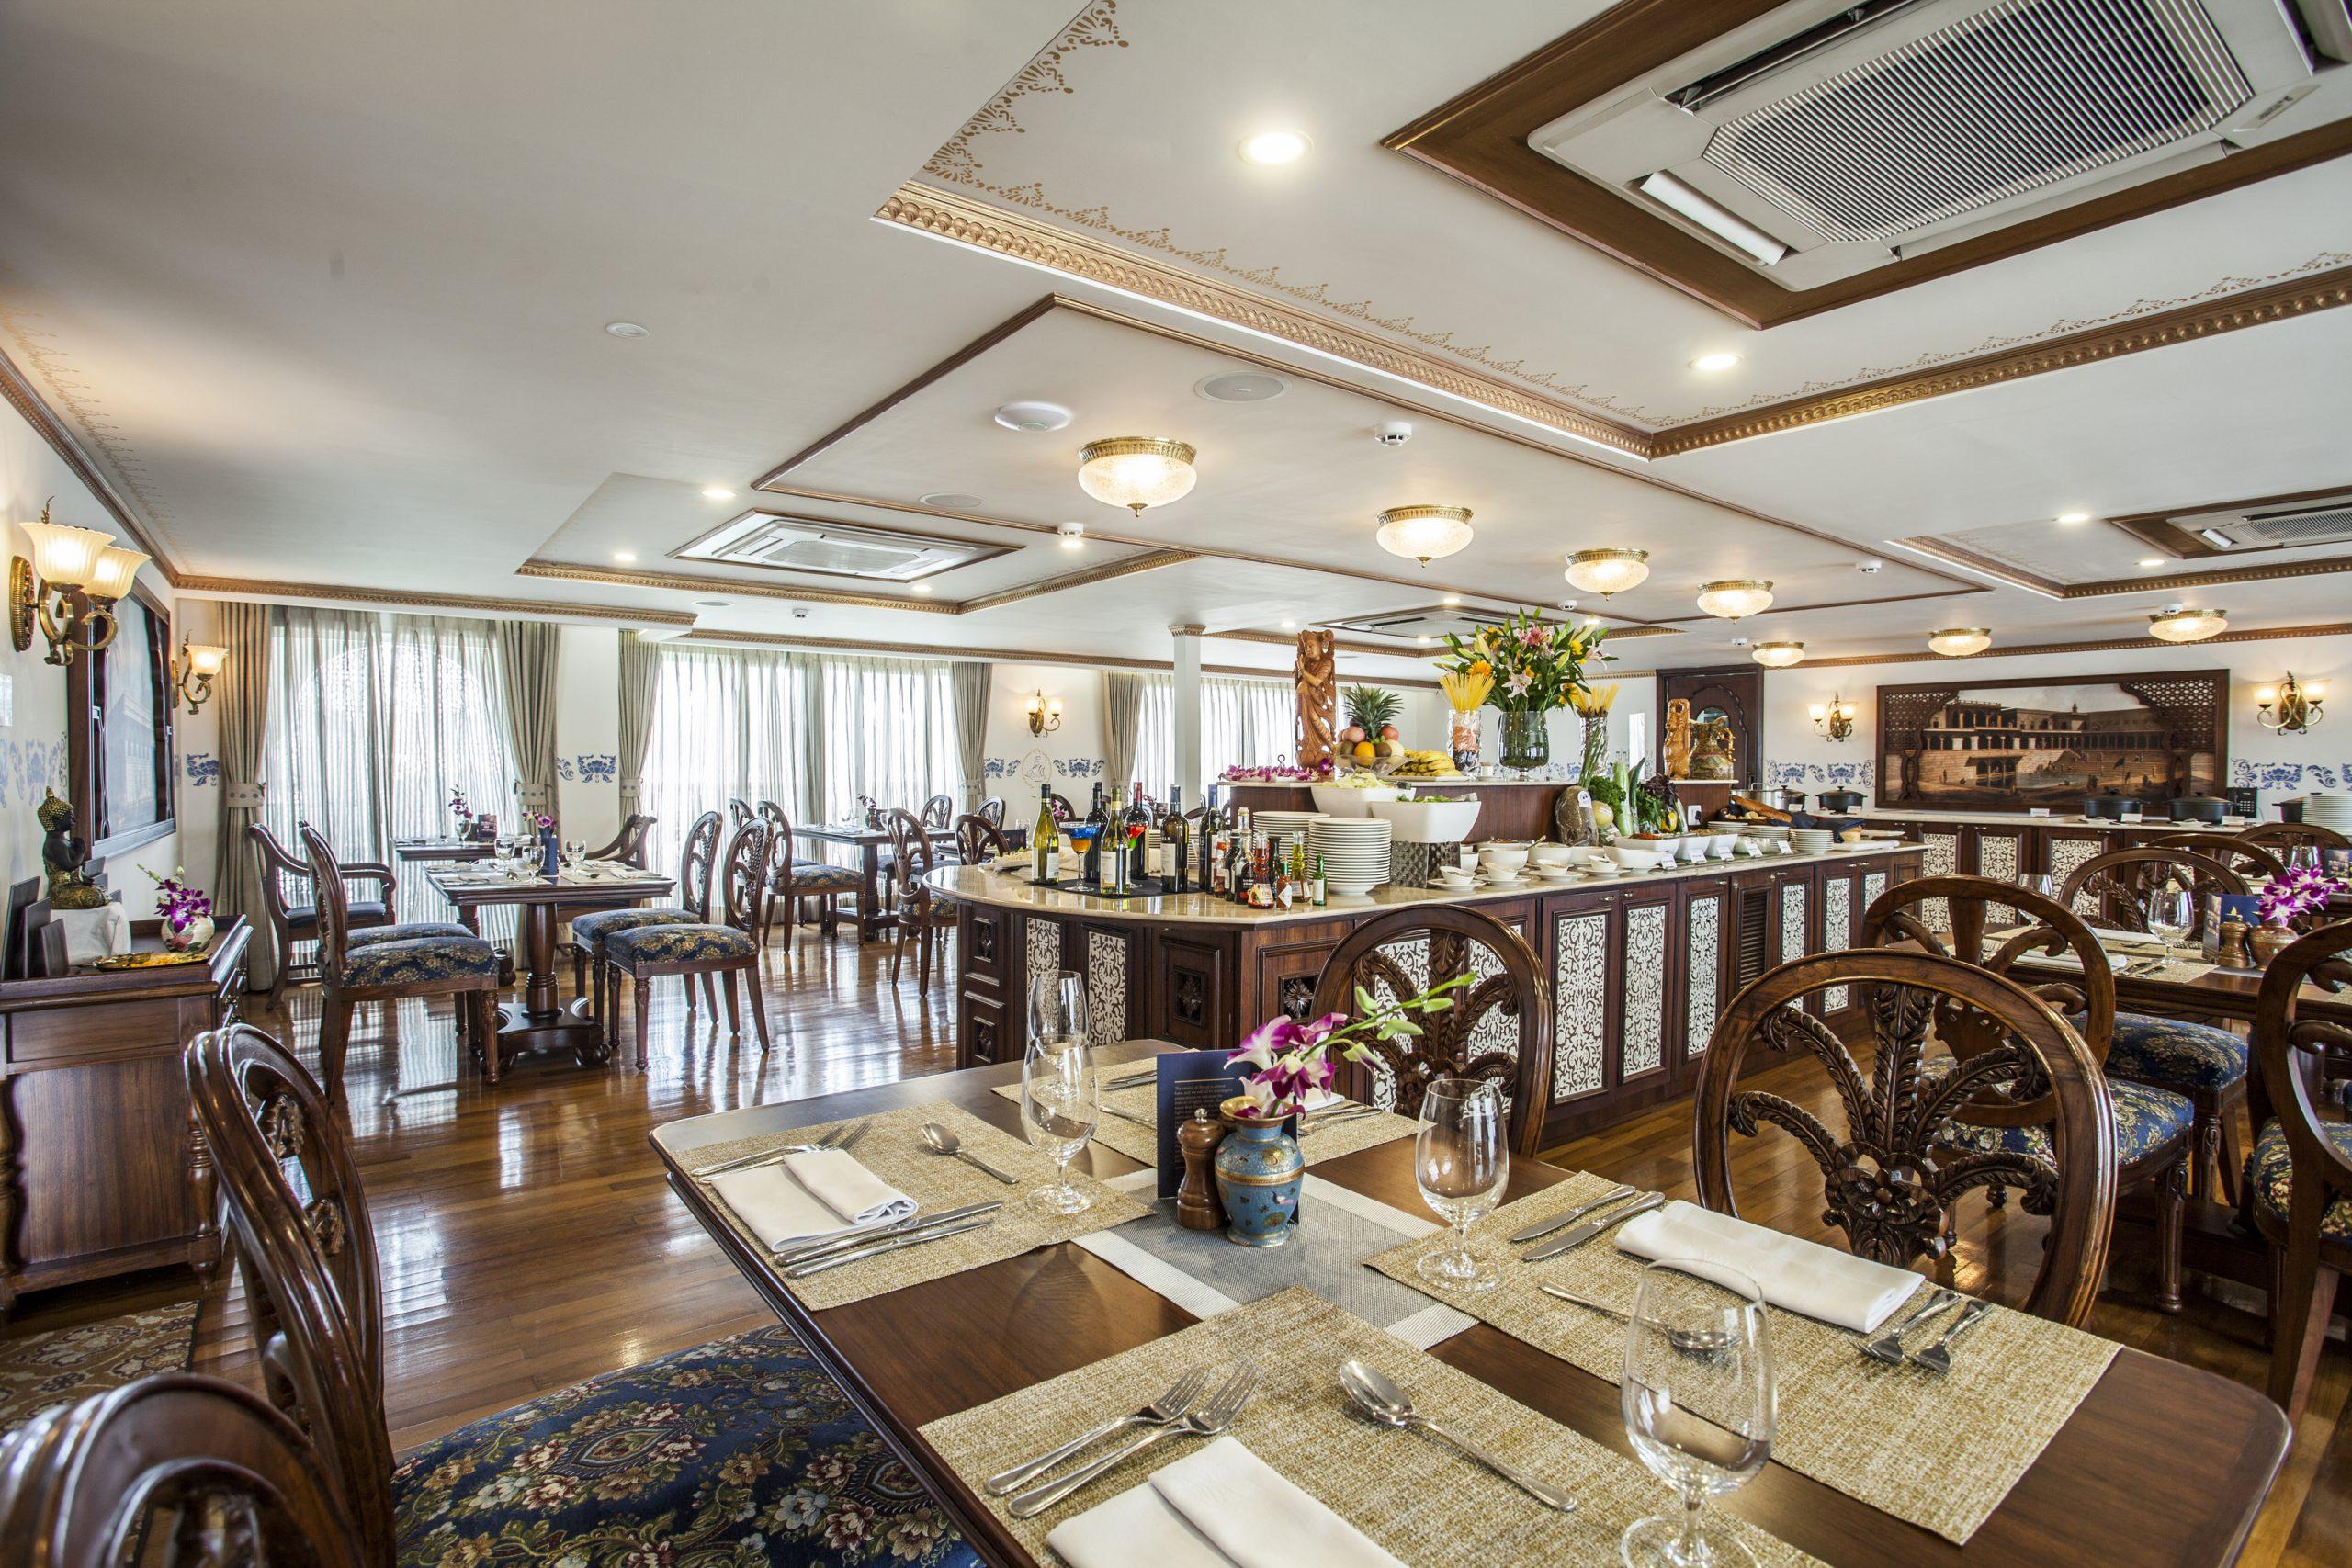 The restaurant on Ganges Voyager -II serves multi-cuisine food